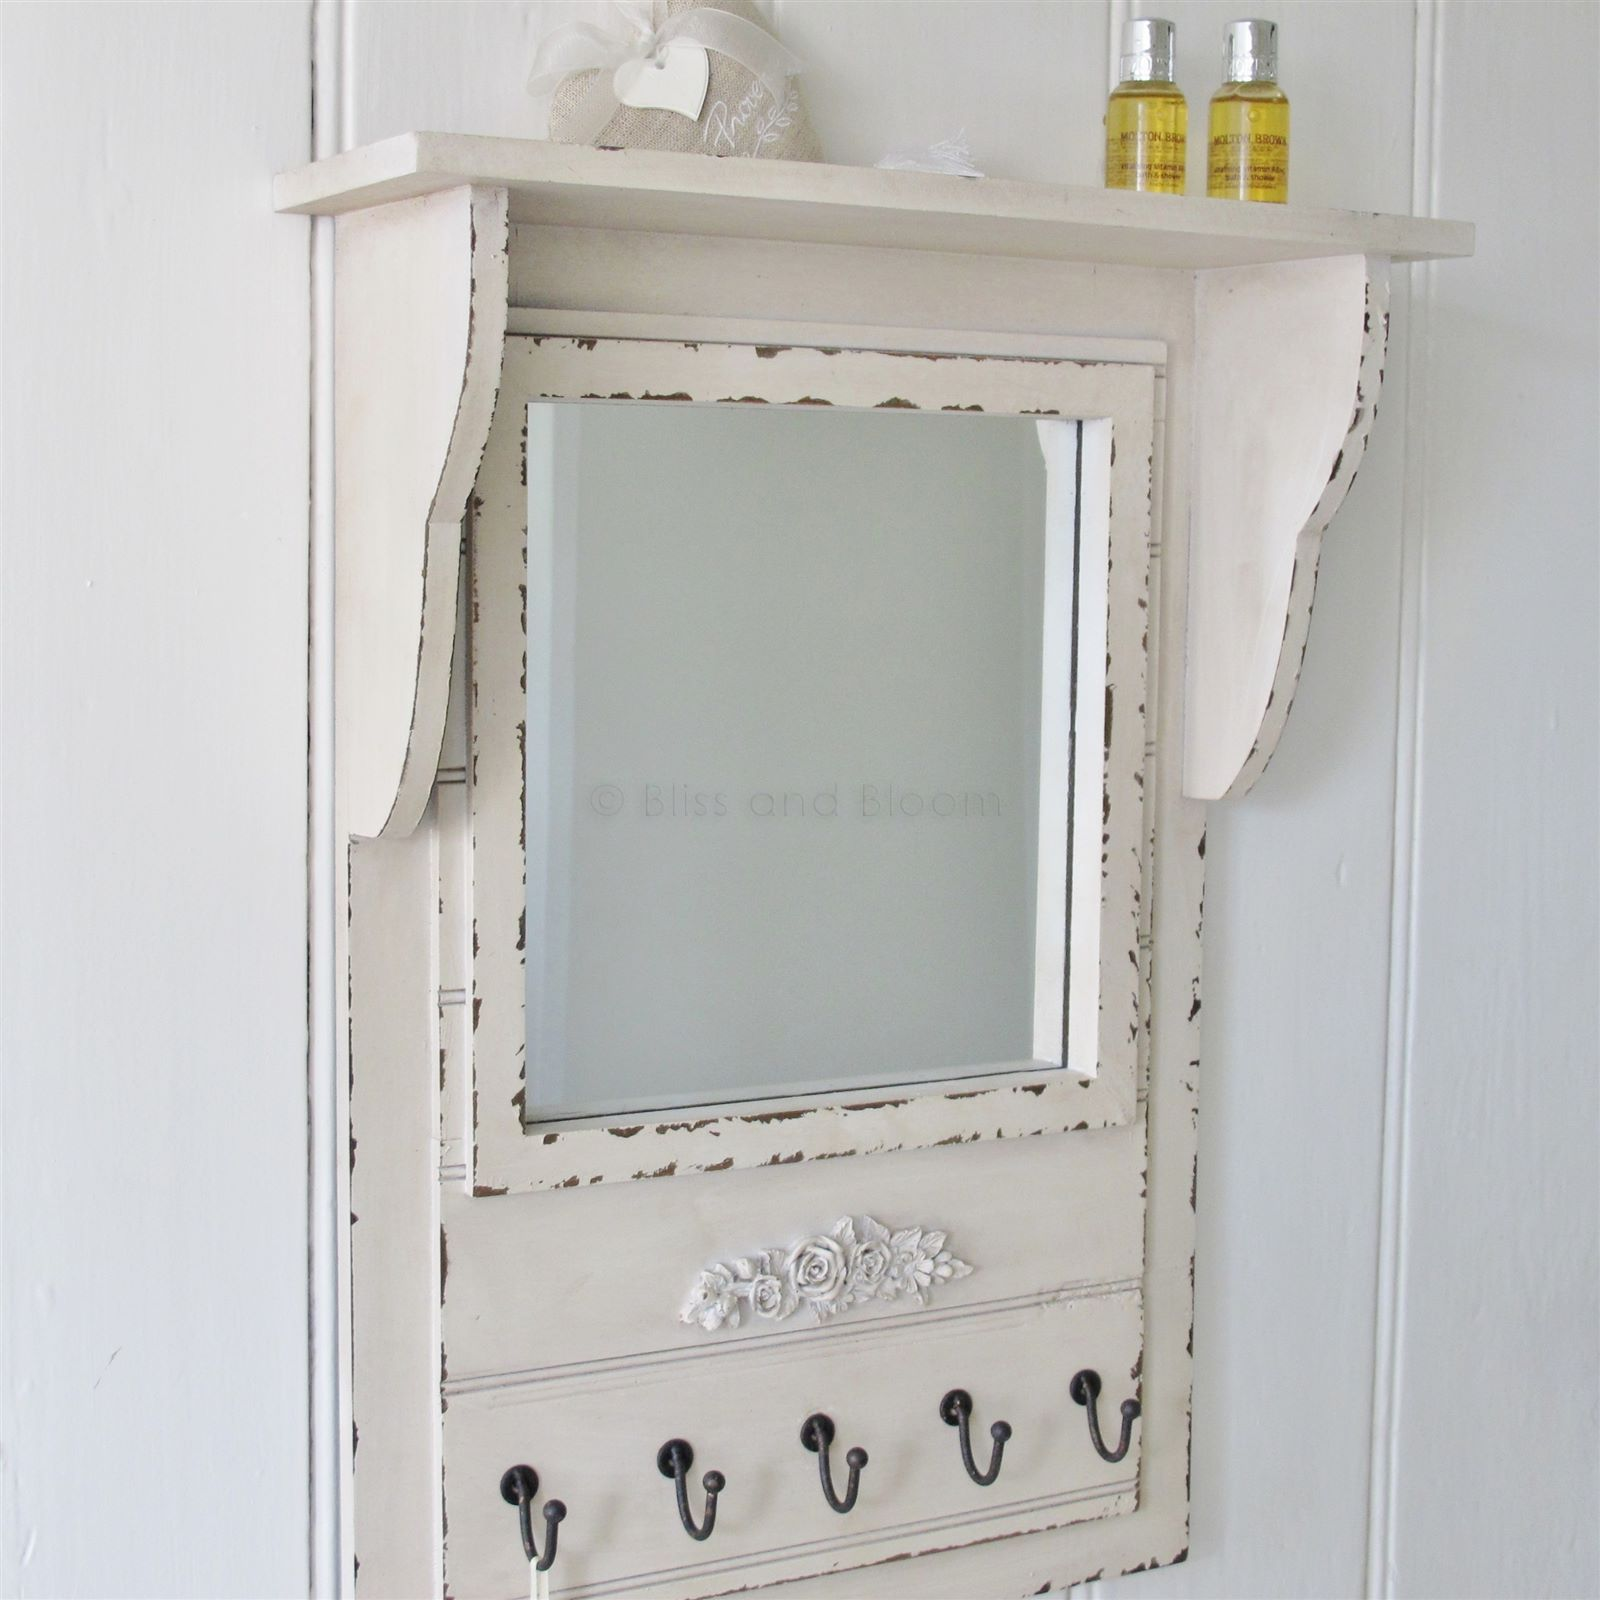 wall mirror shelf hooks bliss and bloom ltd home decor wall rh pinterest com